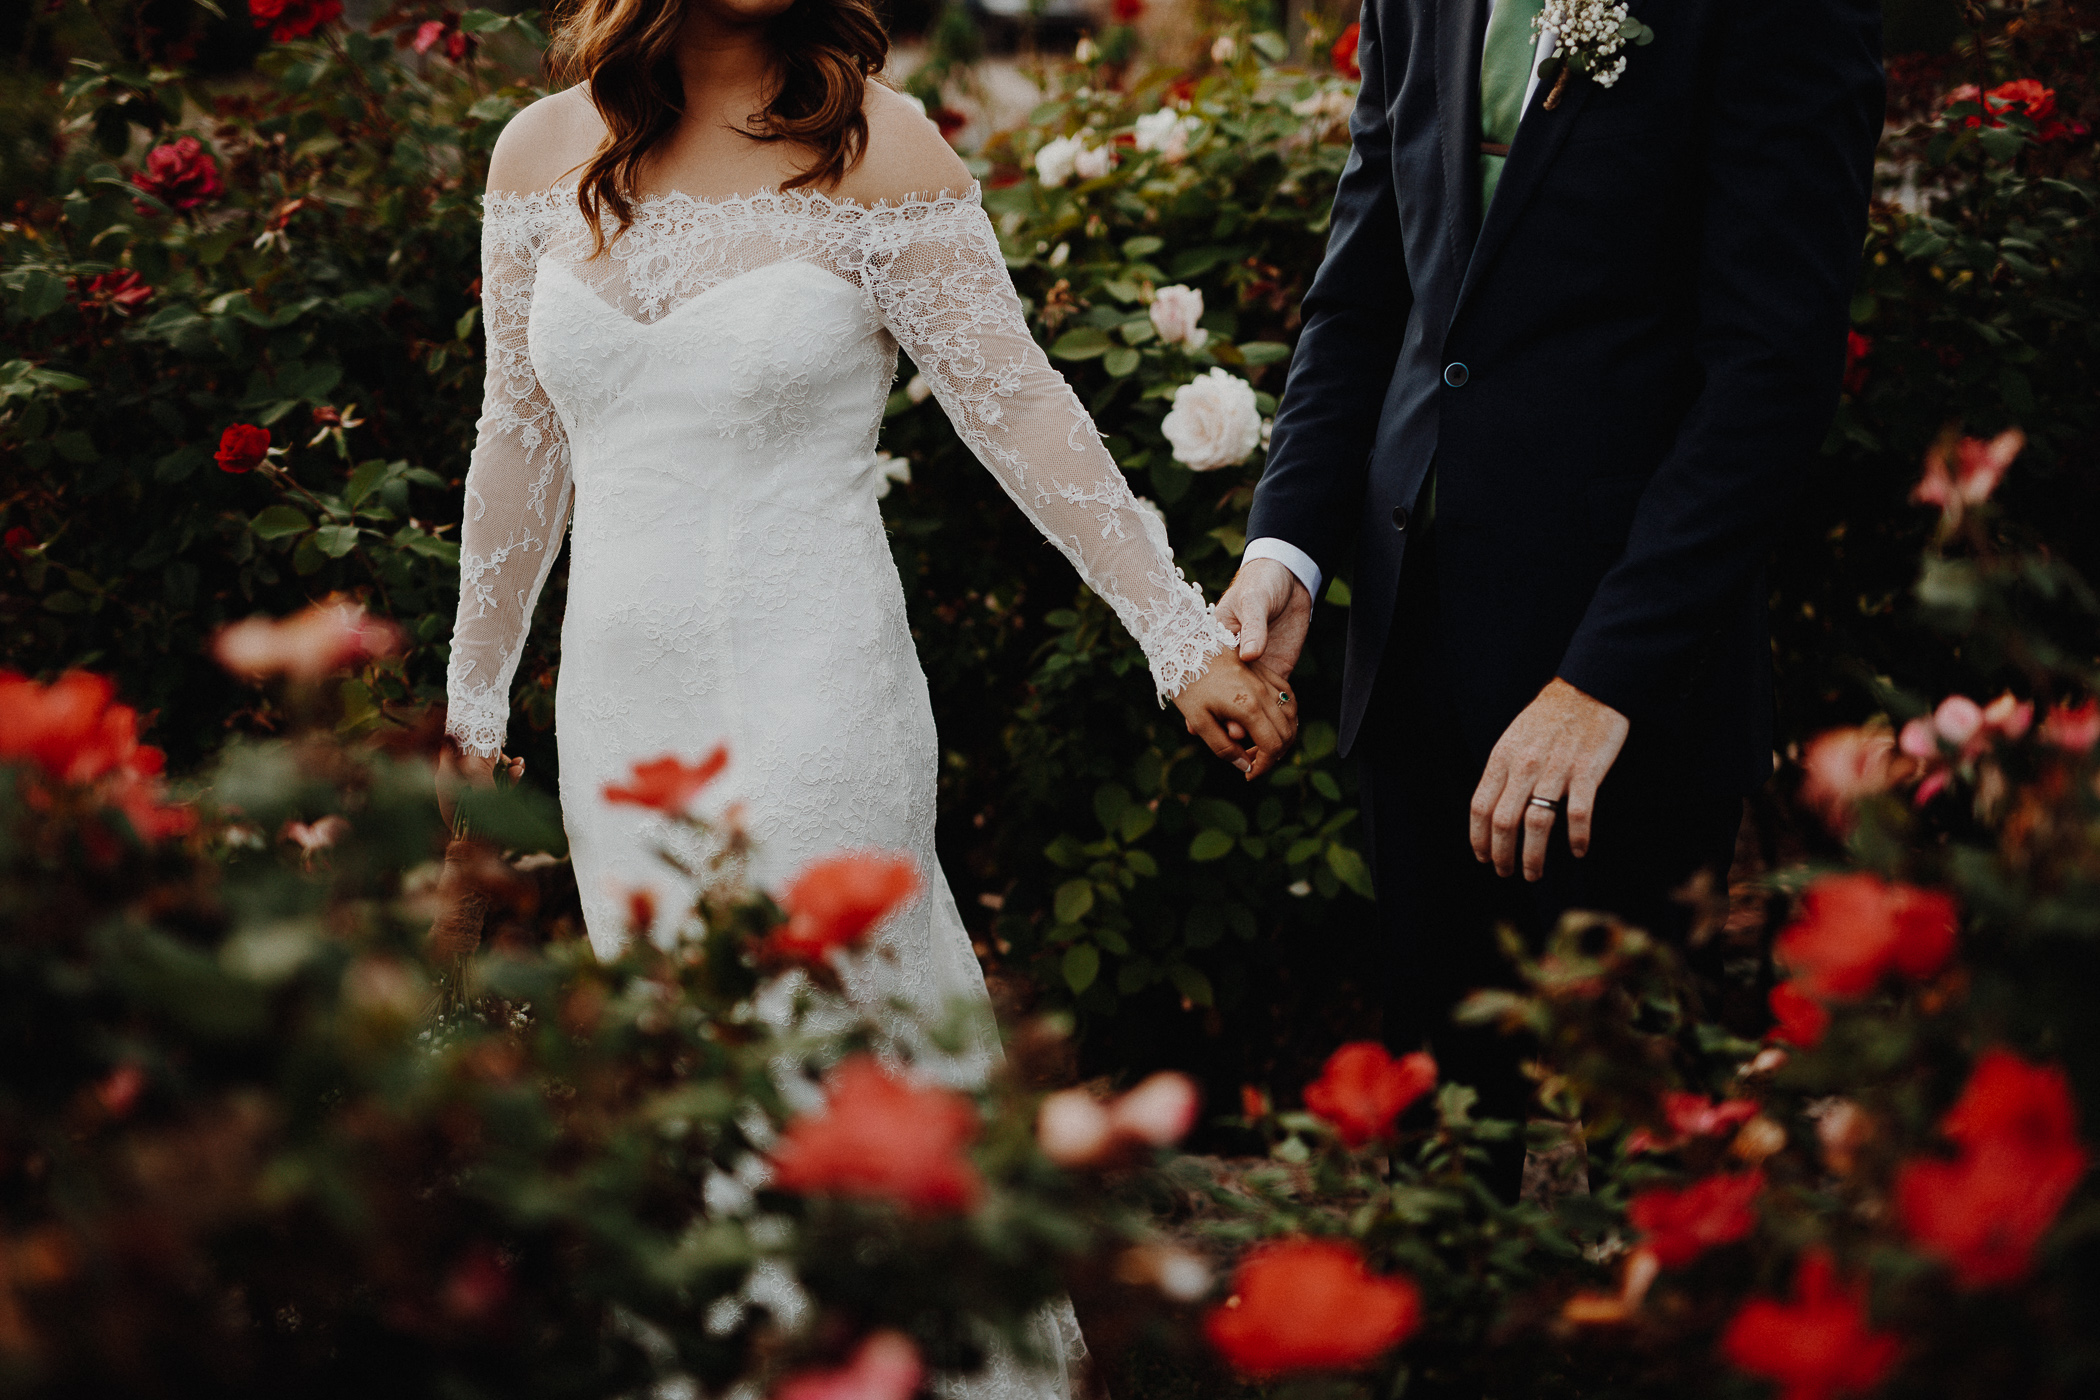 181104-Luxium-Weddings-Arizona-@matt__Le-Brandon-Kariana-Phoenix-Valley-Garden-Center-1118.jpg